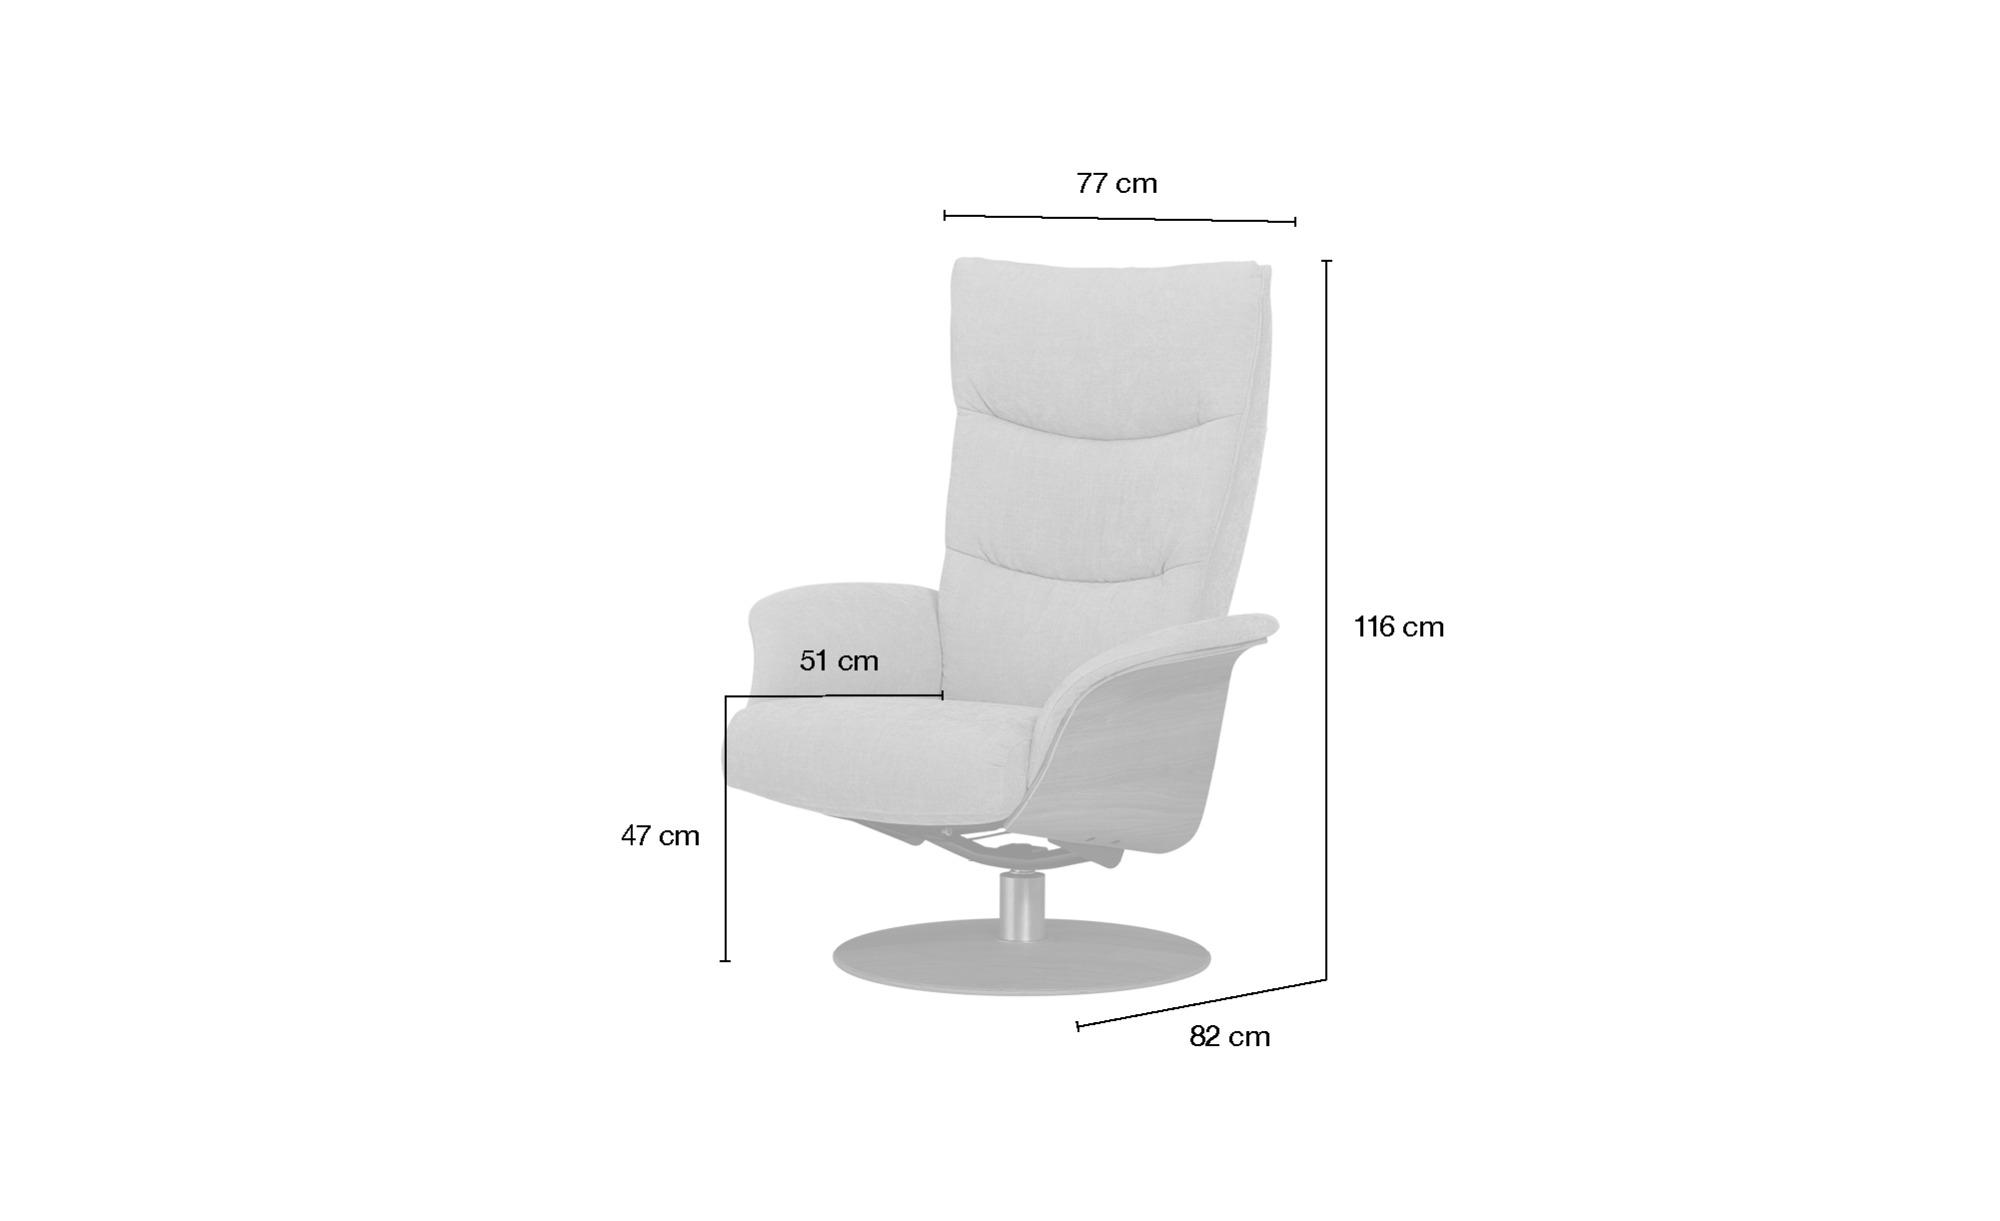 Nils Olsen Relaxsessel  Stian ¦ grün ¦ Maße (cm): B: 77 H: 116 T: 82 Polstermöbel > Sessel > Fernsehsessel - Höffner